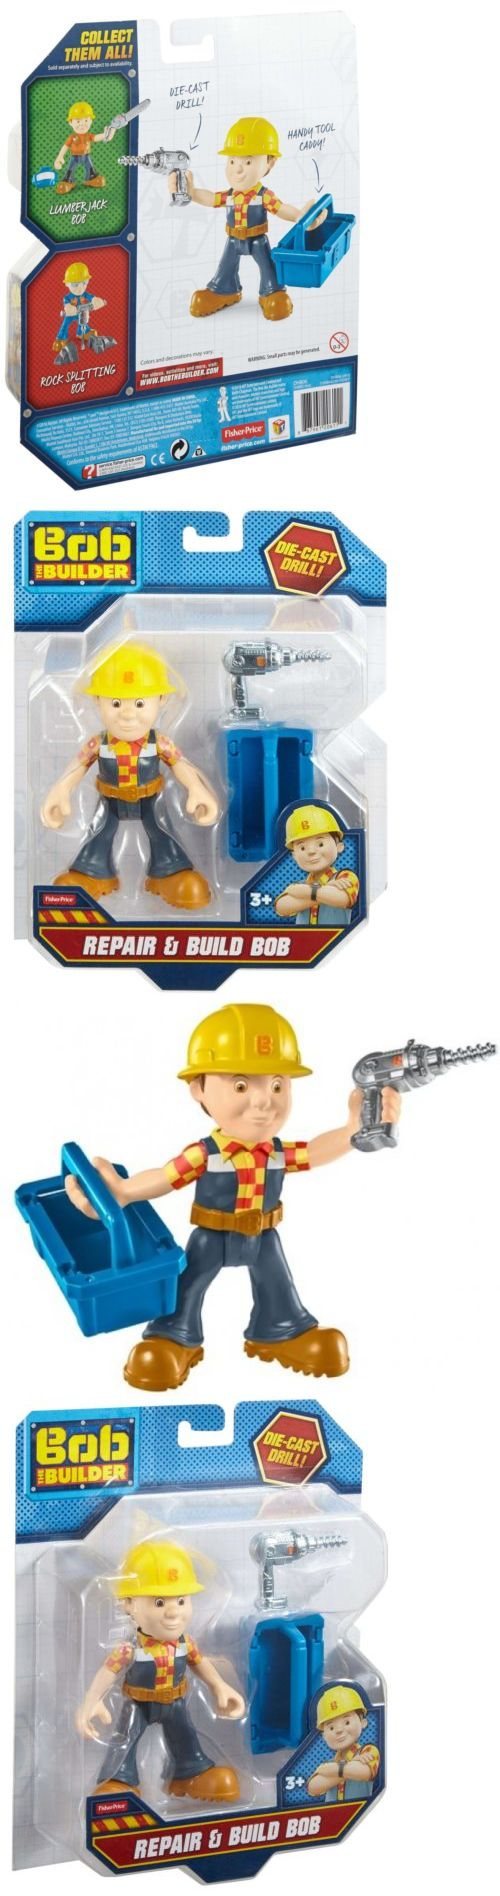 Bob the builder live online dvd rental - Bob The Builder 20902 Bob The Builder Everyday Bob Figure Buy It Now